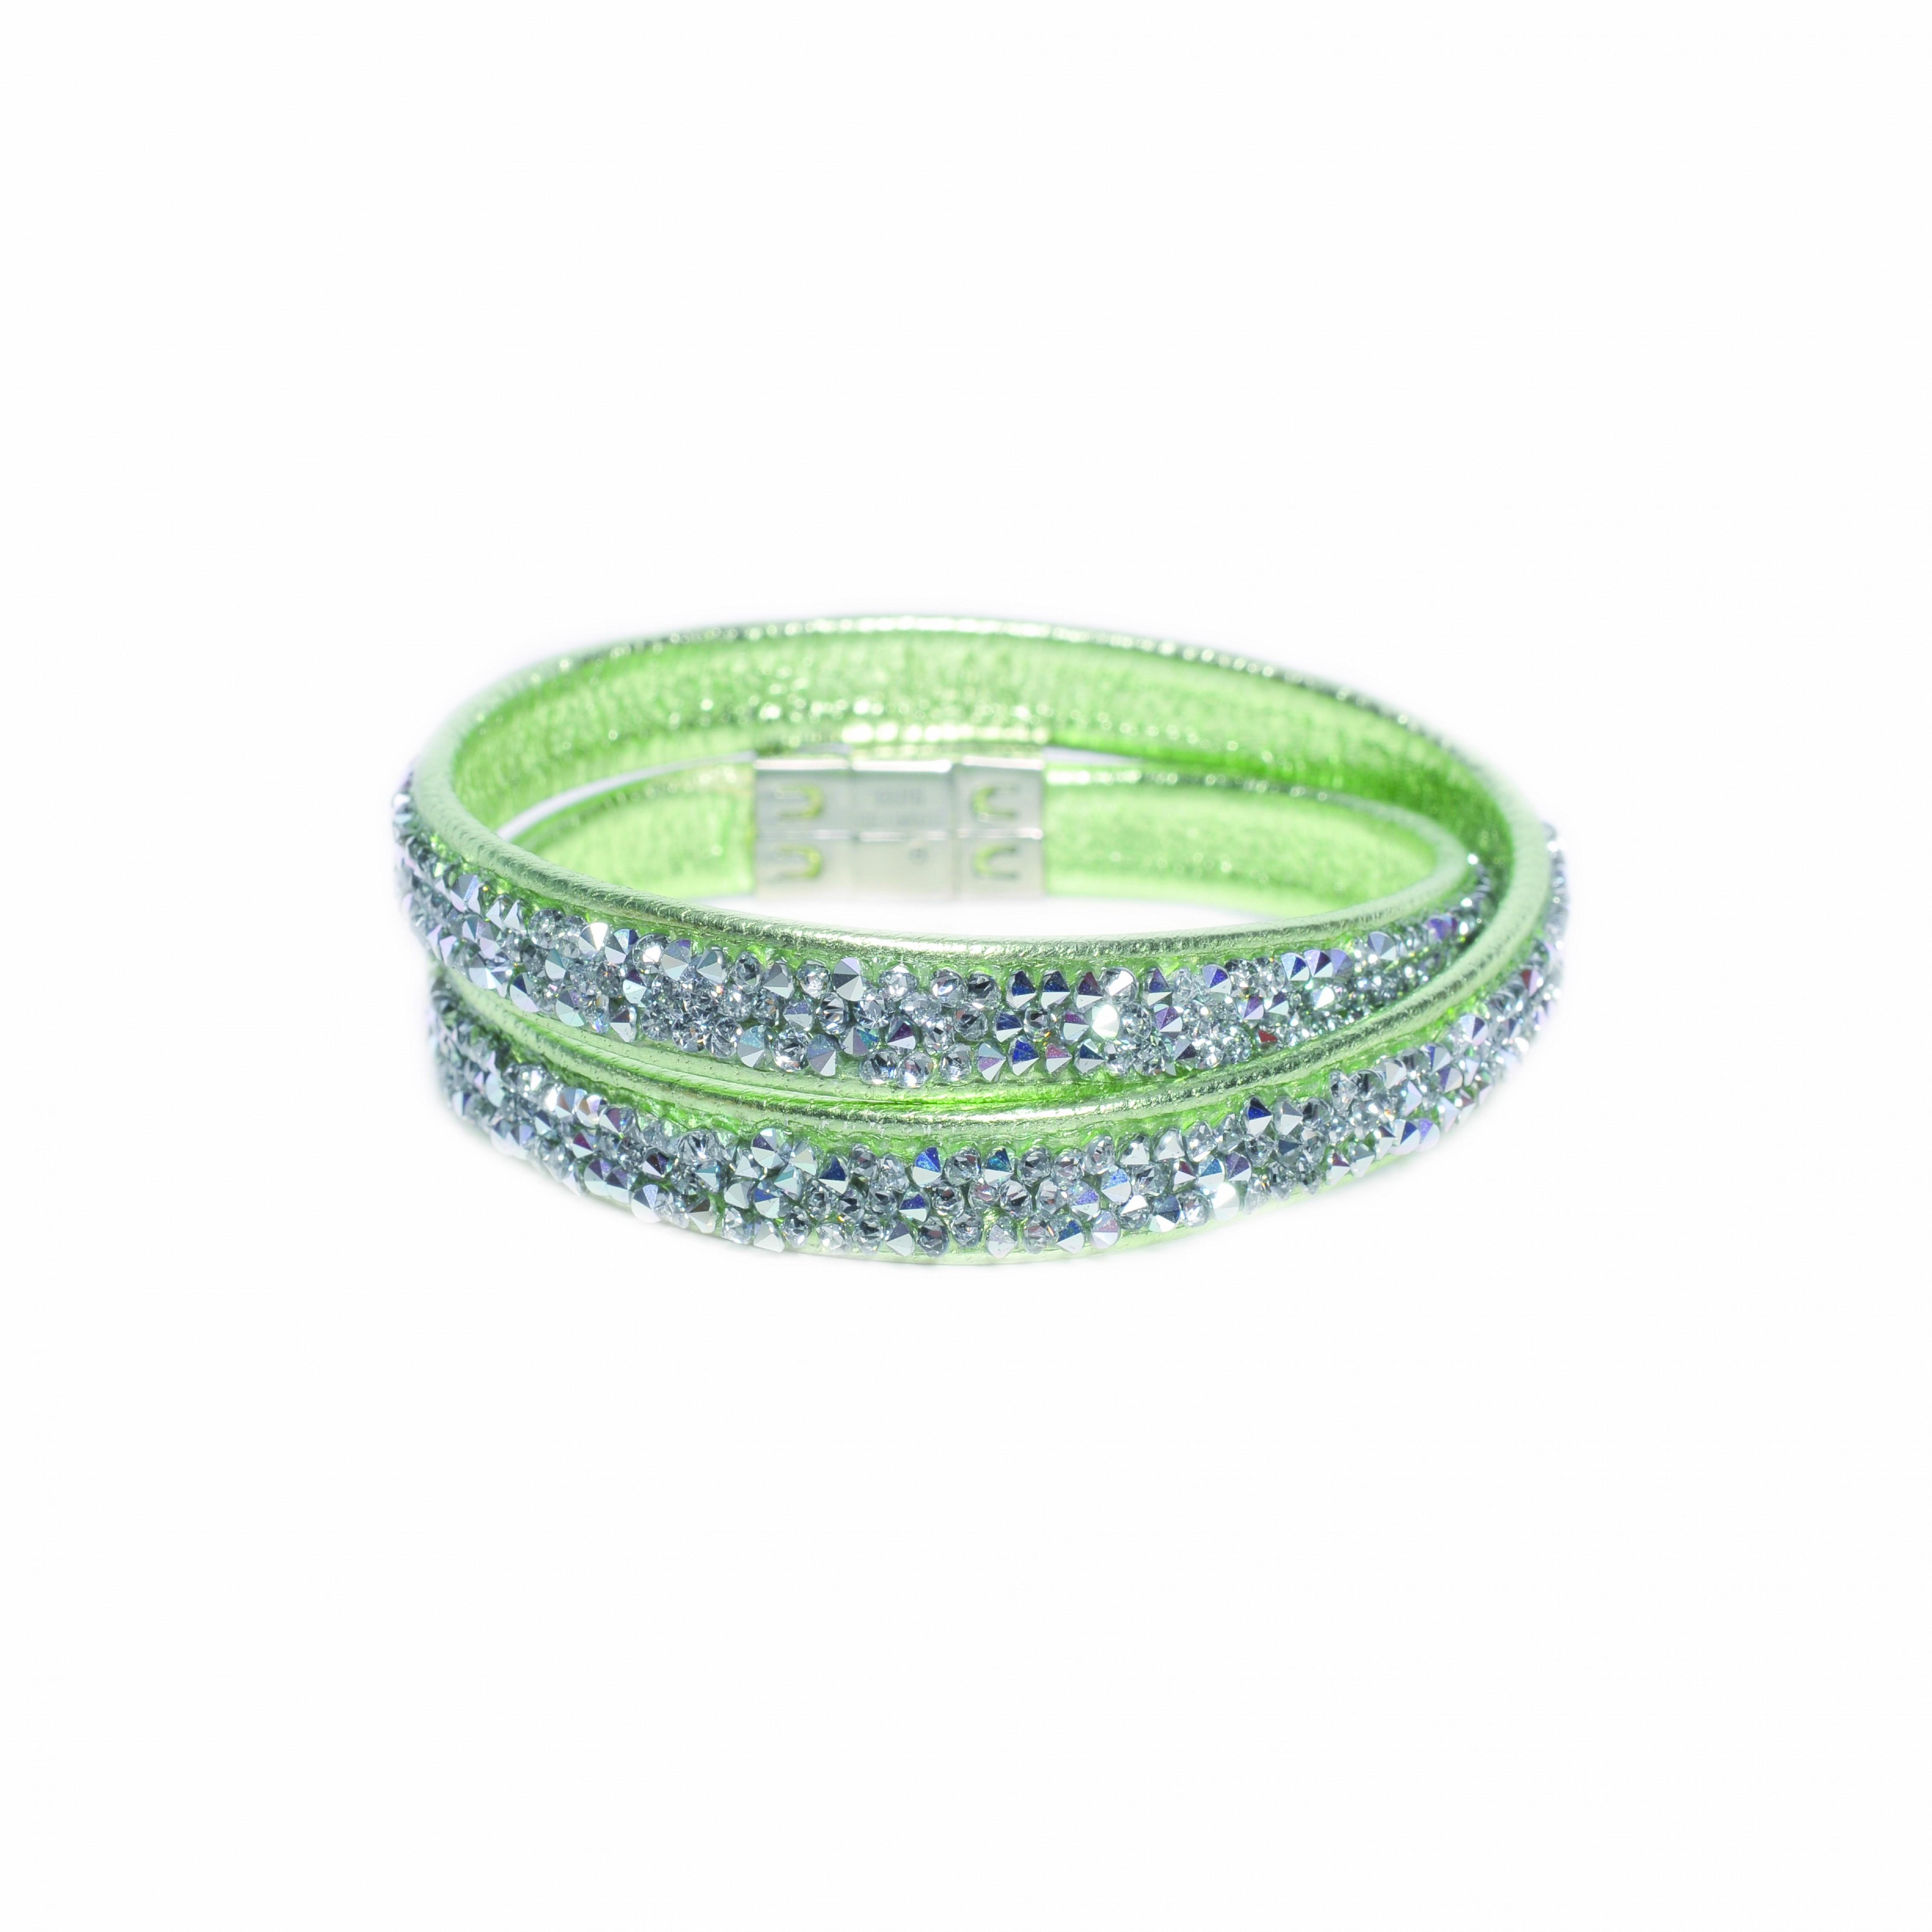 LOVING CRYSTAL Lederarmband mit Swarovski-Steinen | Schmuck > Armbänder > Lederarmbänder | Leder | Loving Crystal